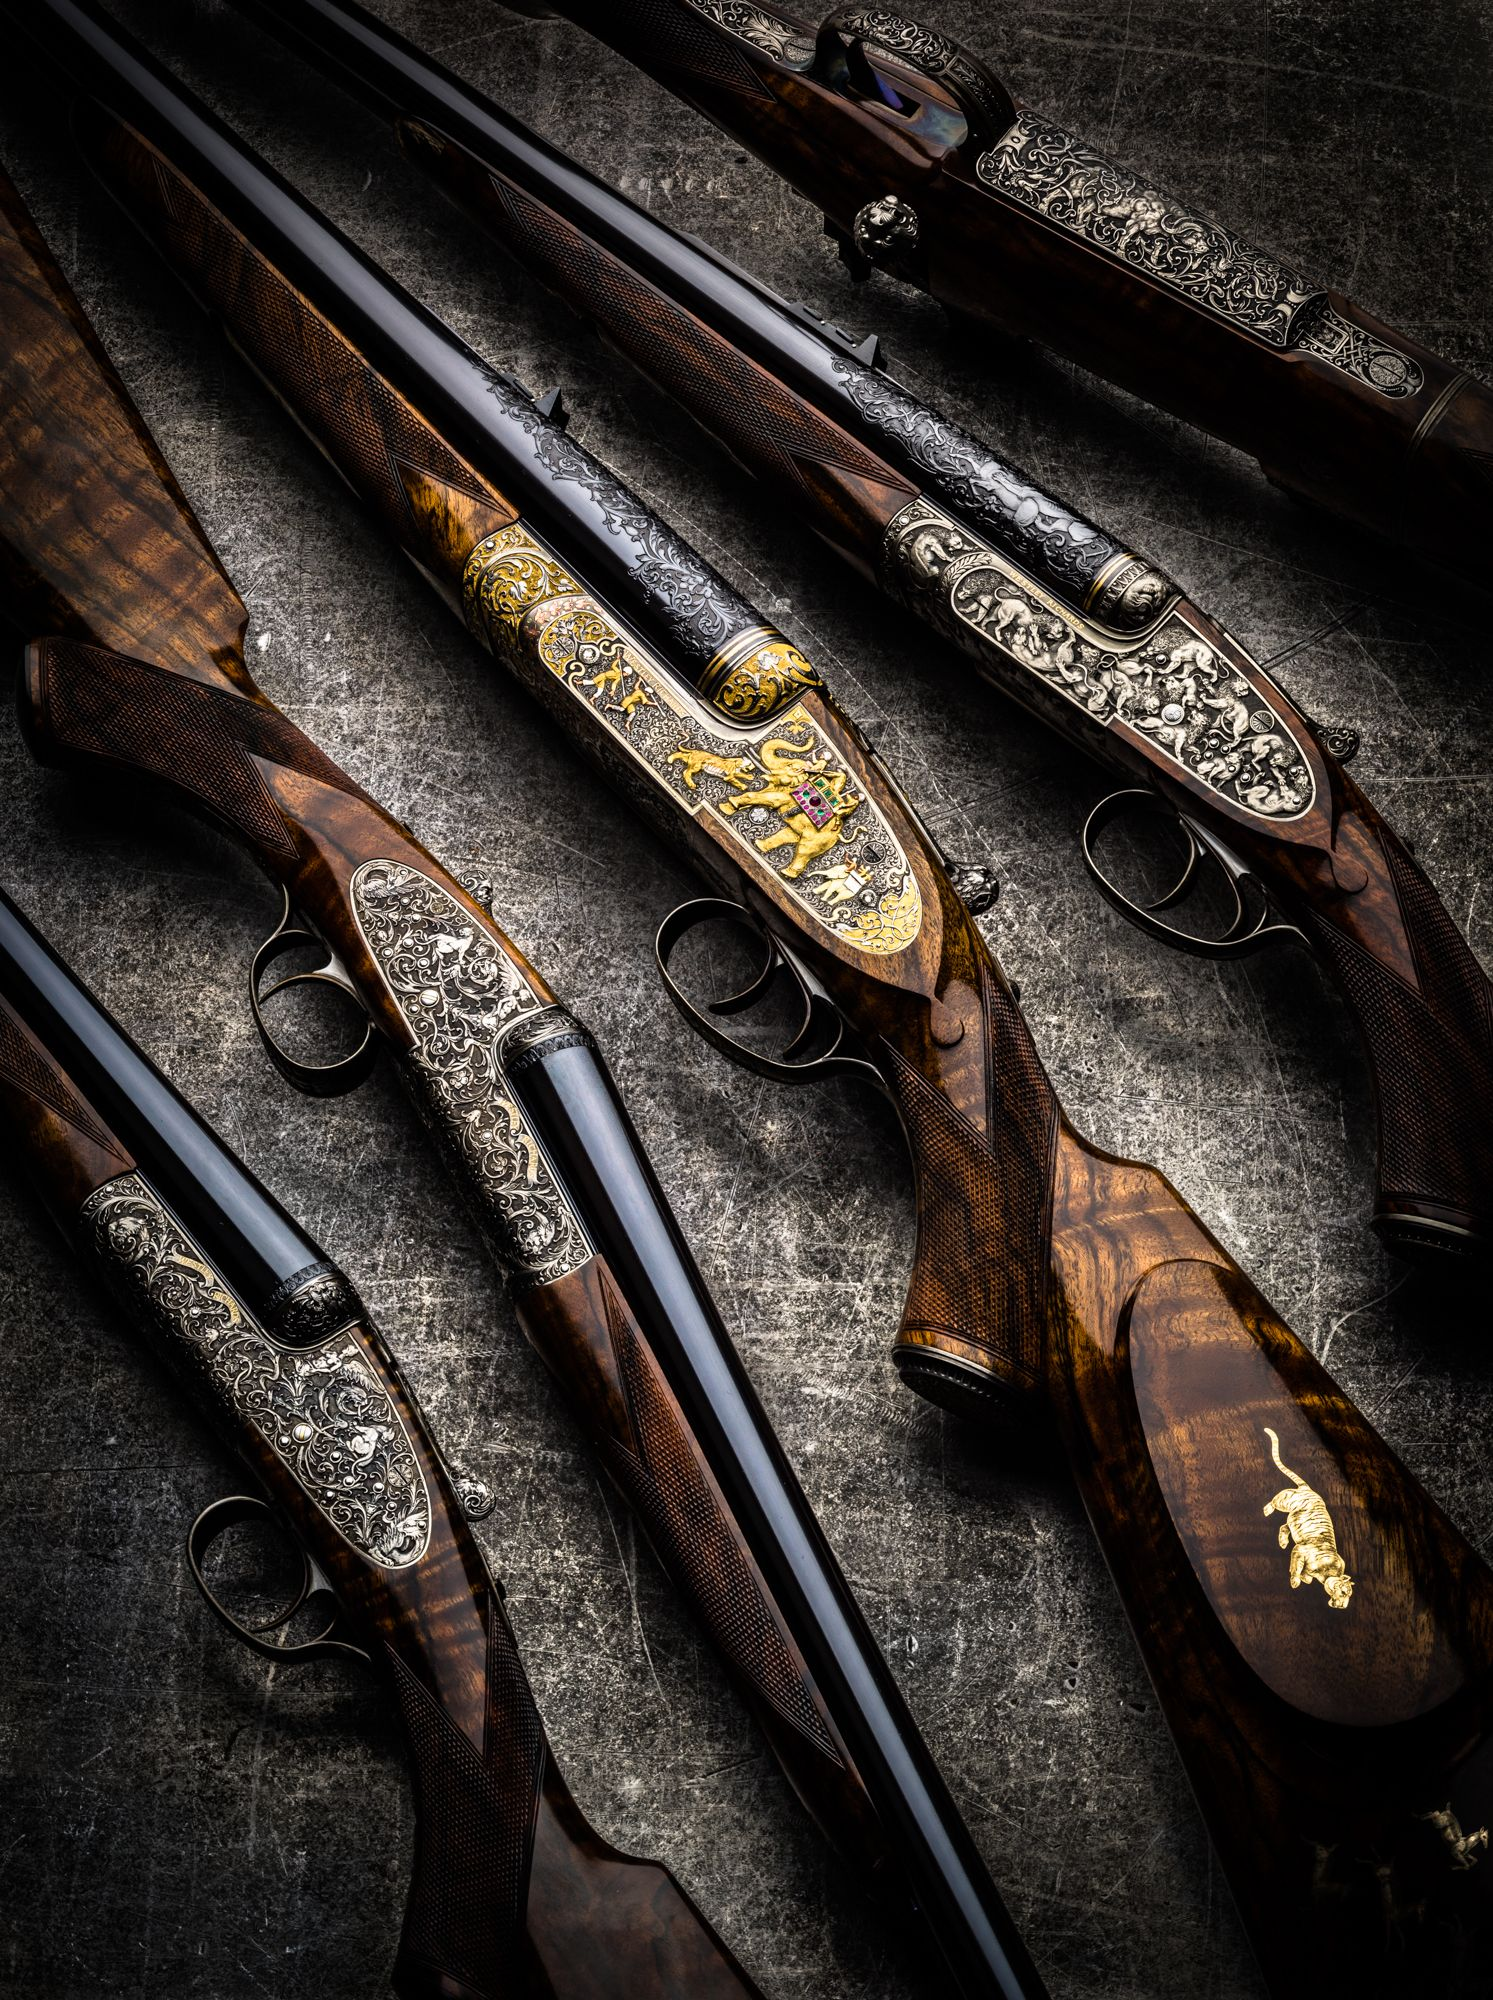 Lovačko oružje i municija - Page 5 85cdd95855be9c715a50945ac7e18888